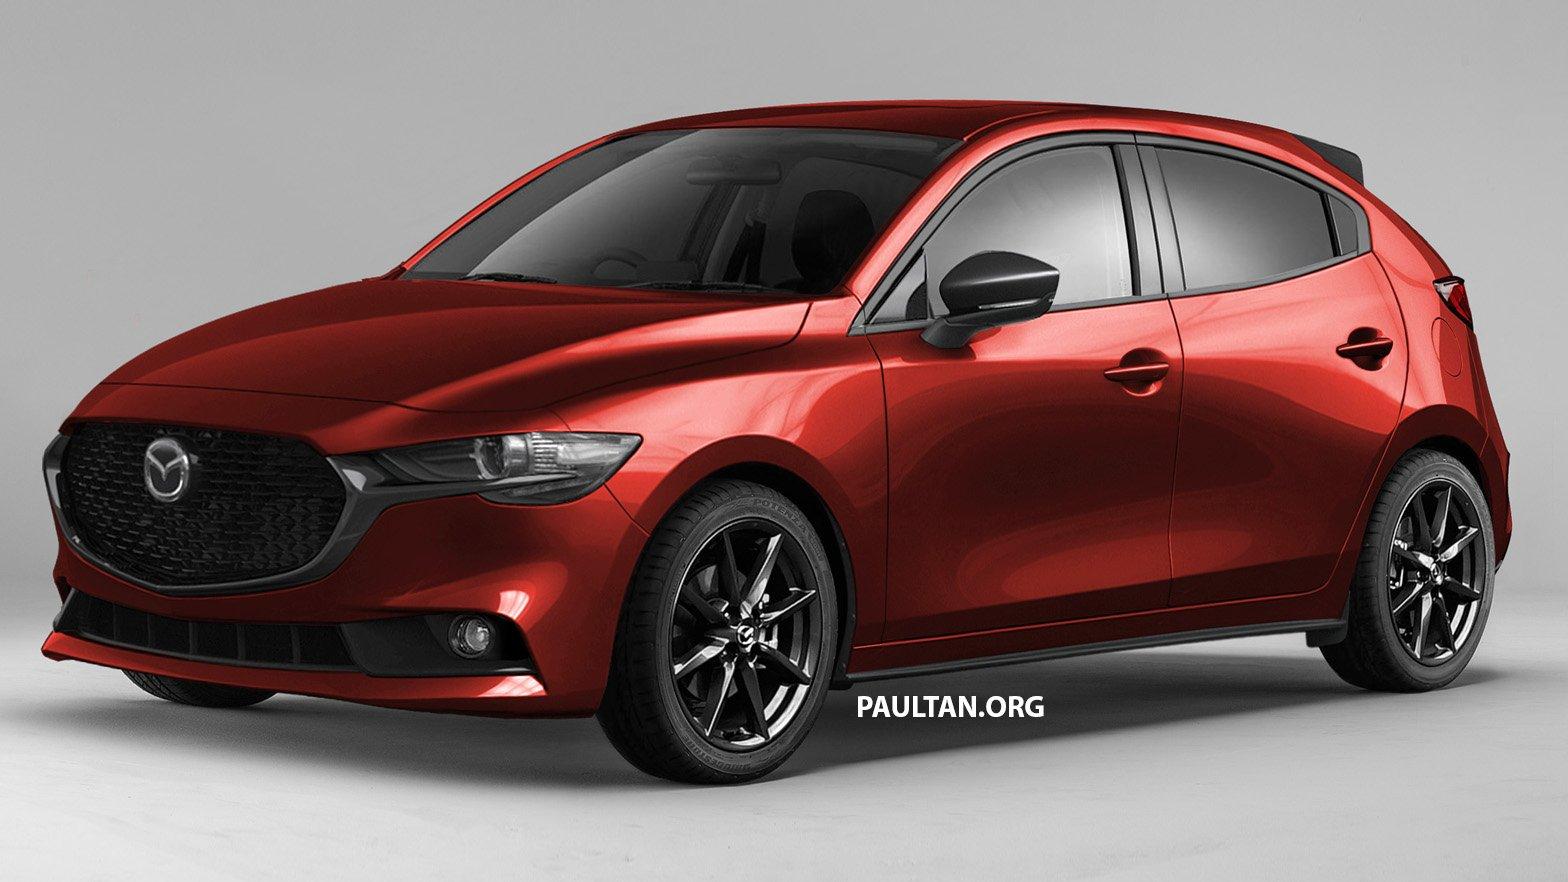 Kelebihan Mazda 2 Olx Tangguh